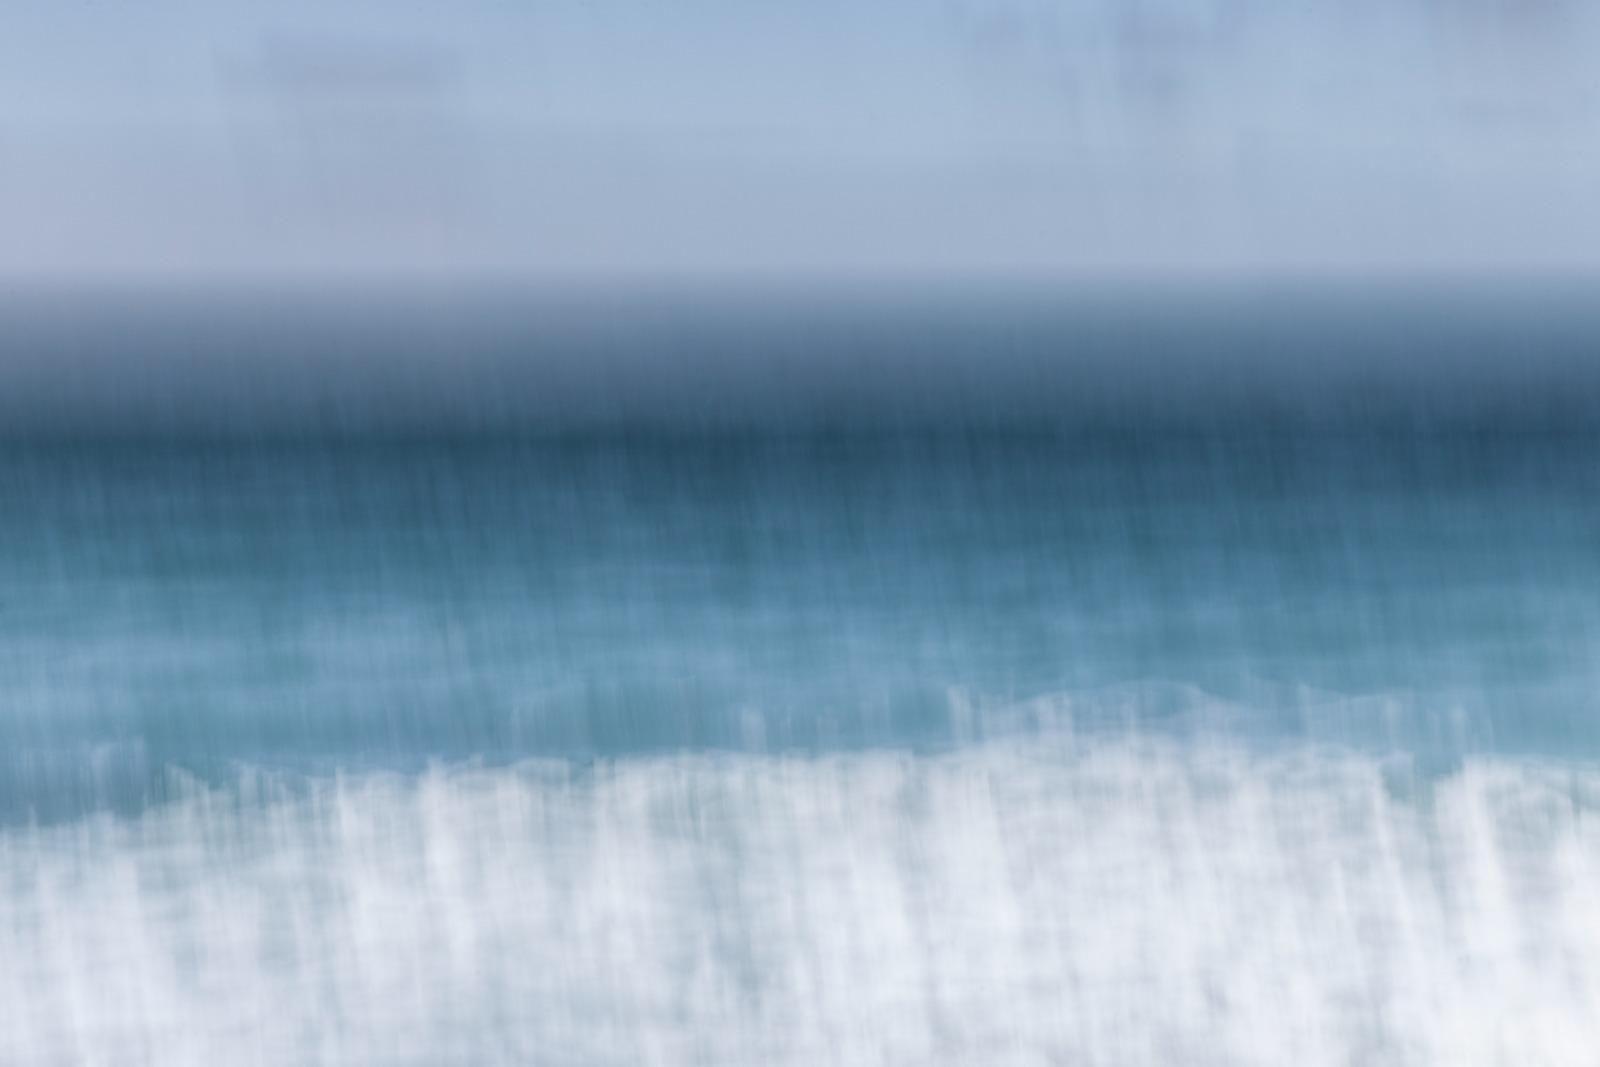 In Blue - Sennen II  / Abstract Cornish Seascape / A3 Print